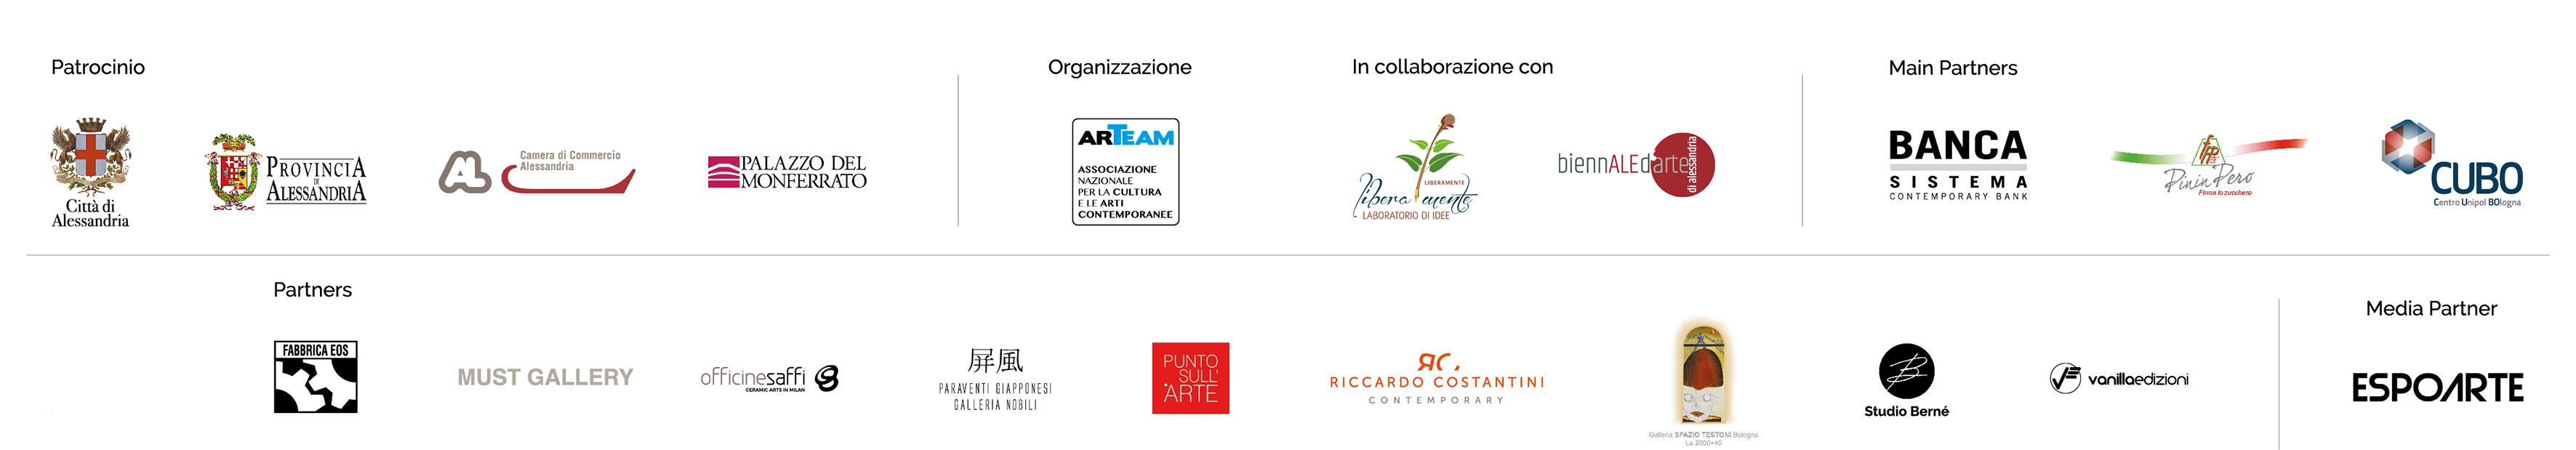 Partners Arteam Cup 2016